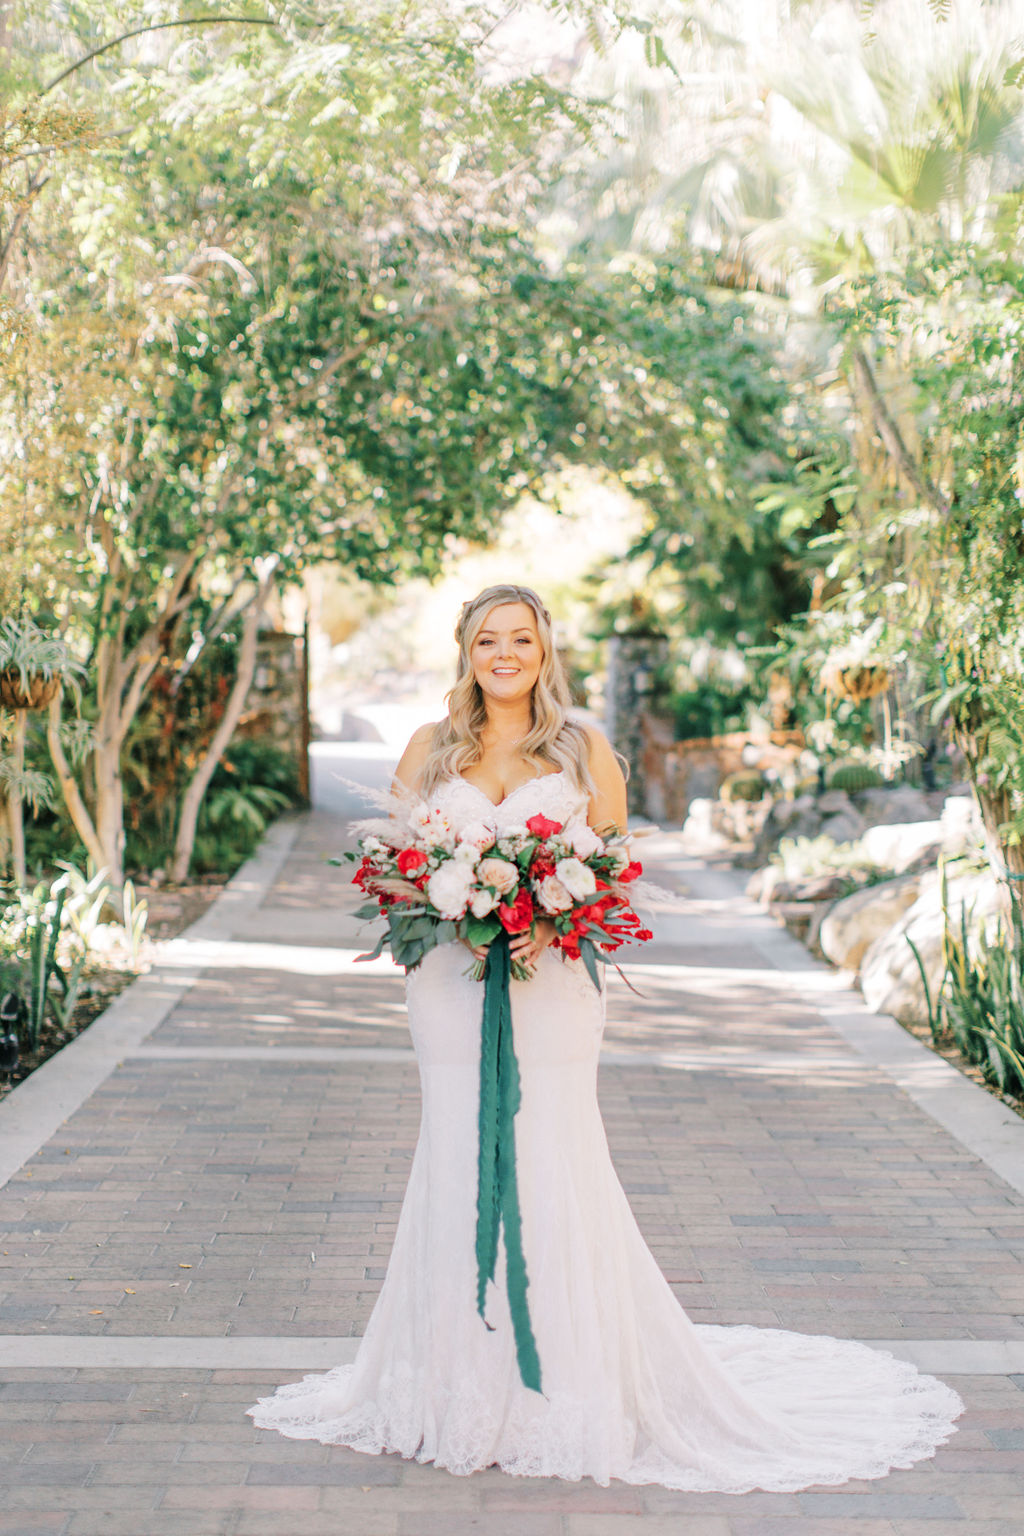 meagan robert wedding bride in courtyard